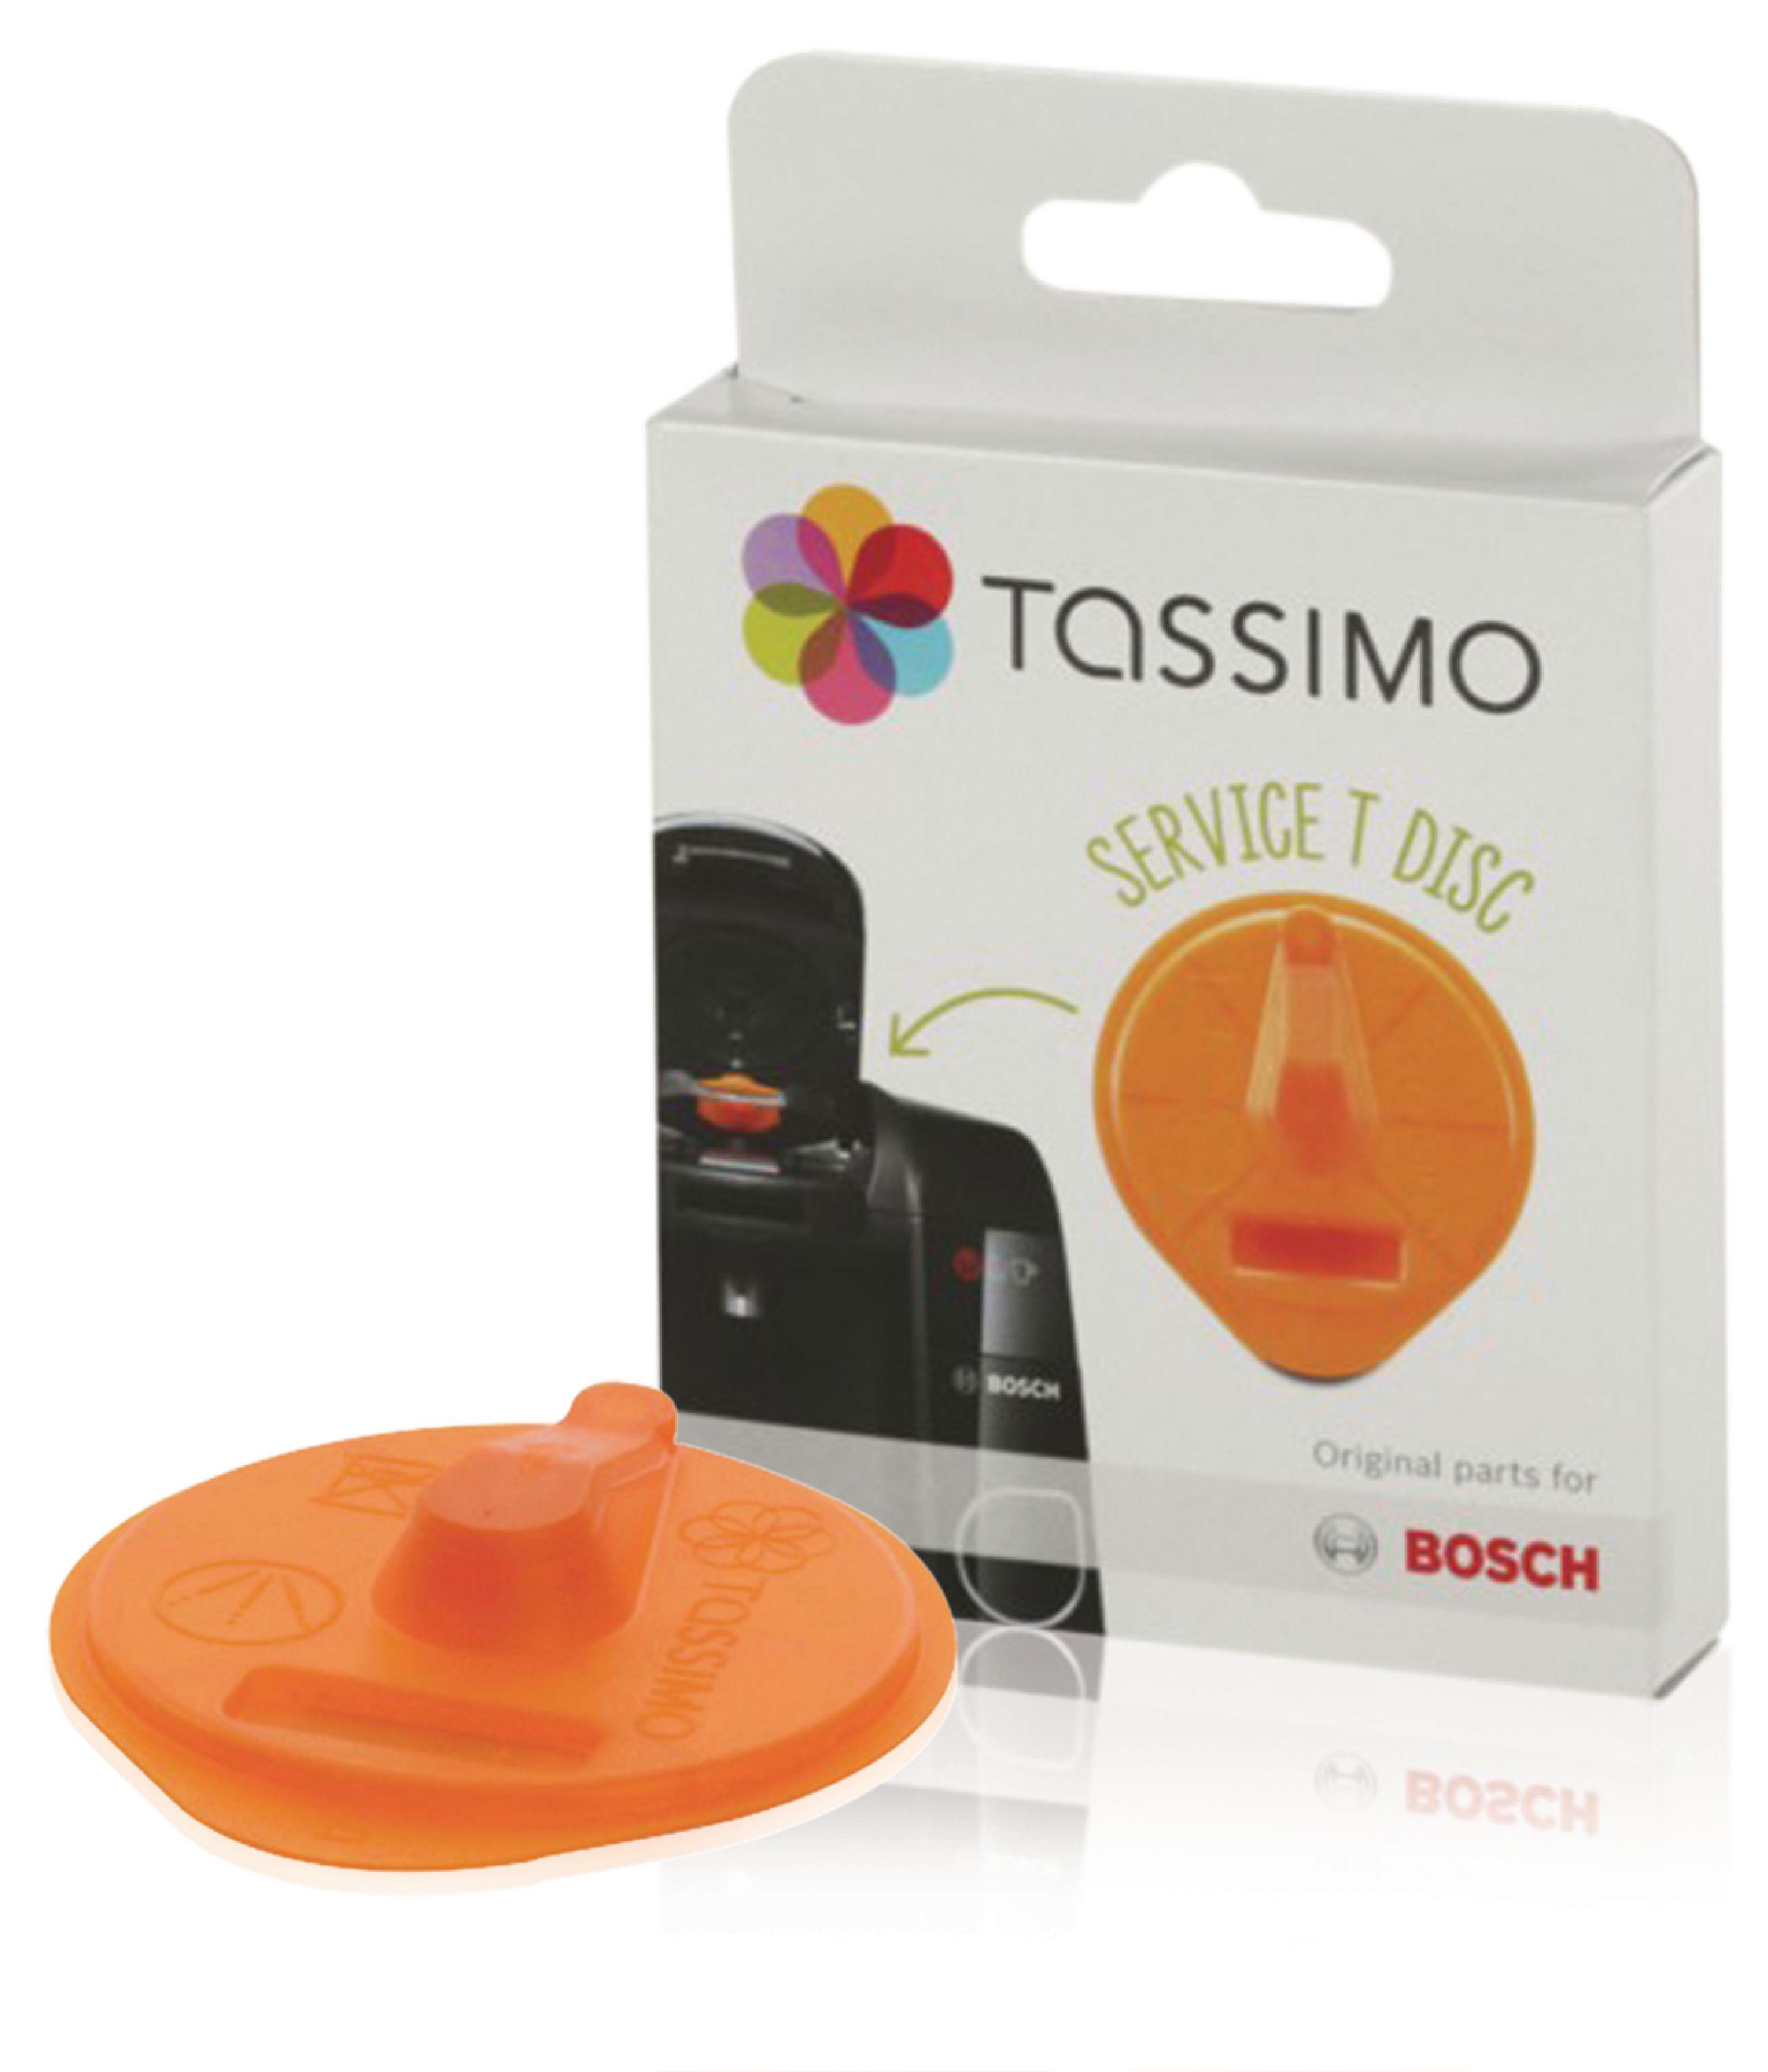 Servisní T-Disk pro kávovar Tassimo orig. 576837